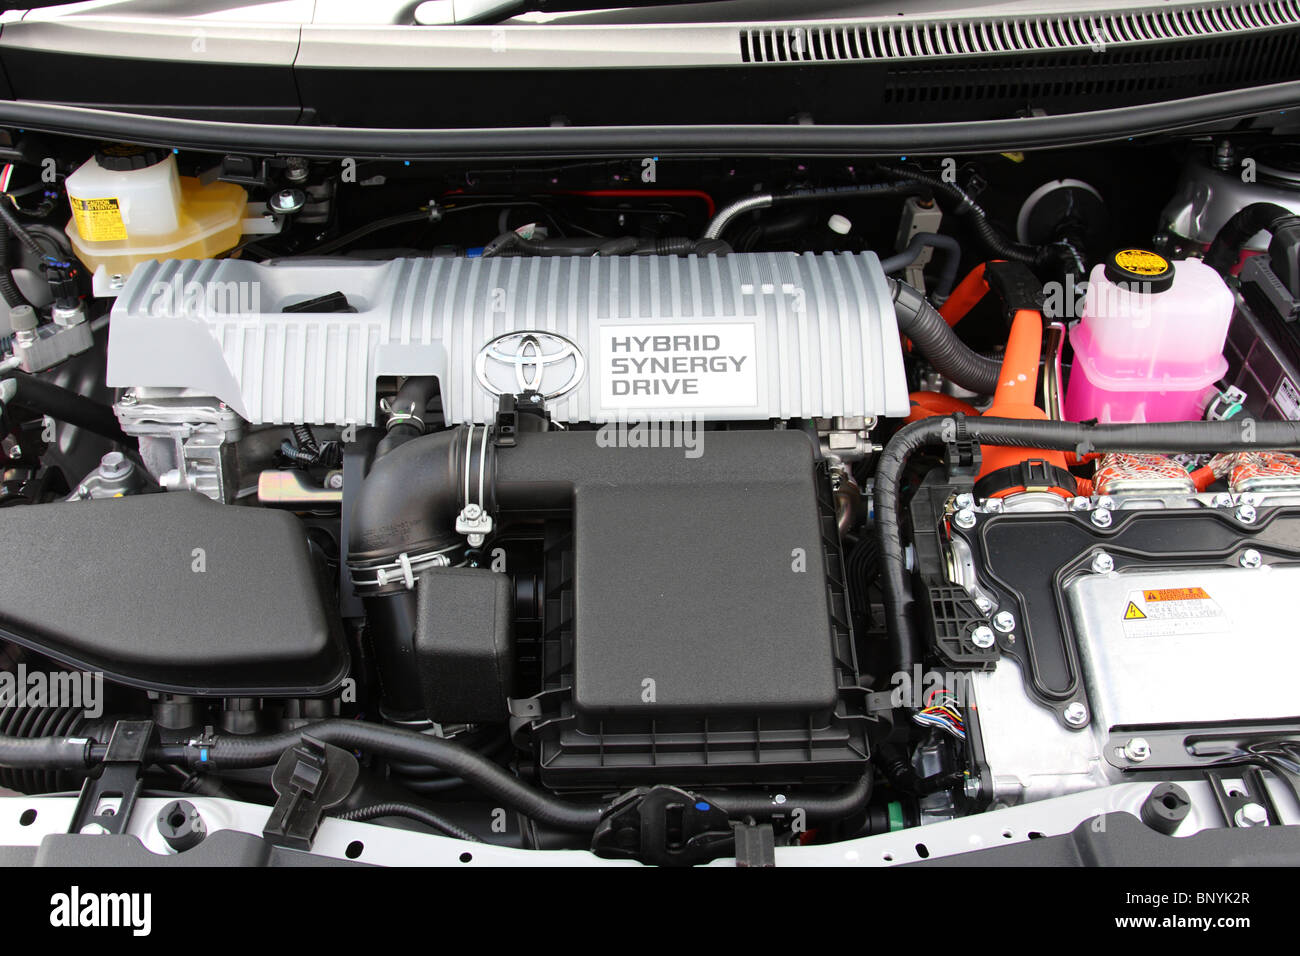 A Toyota hybrid engine. - Stock Image